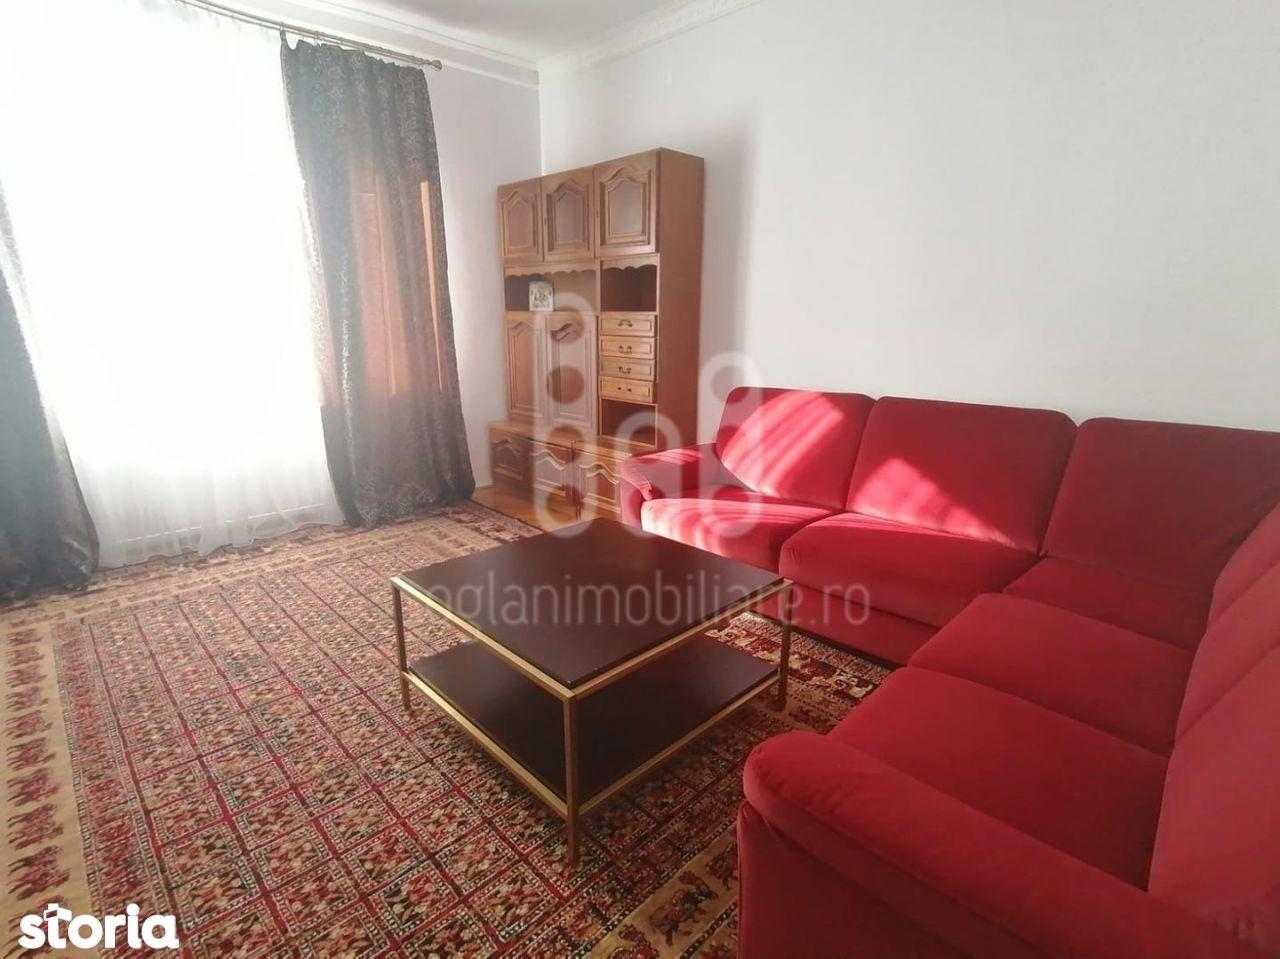 Apartament 3 camere, Str. Darstelor - Piata Cibin